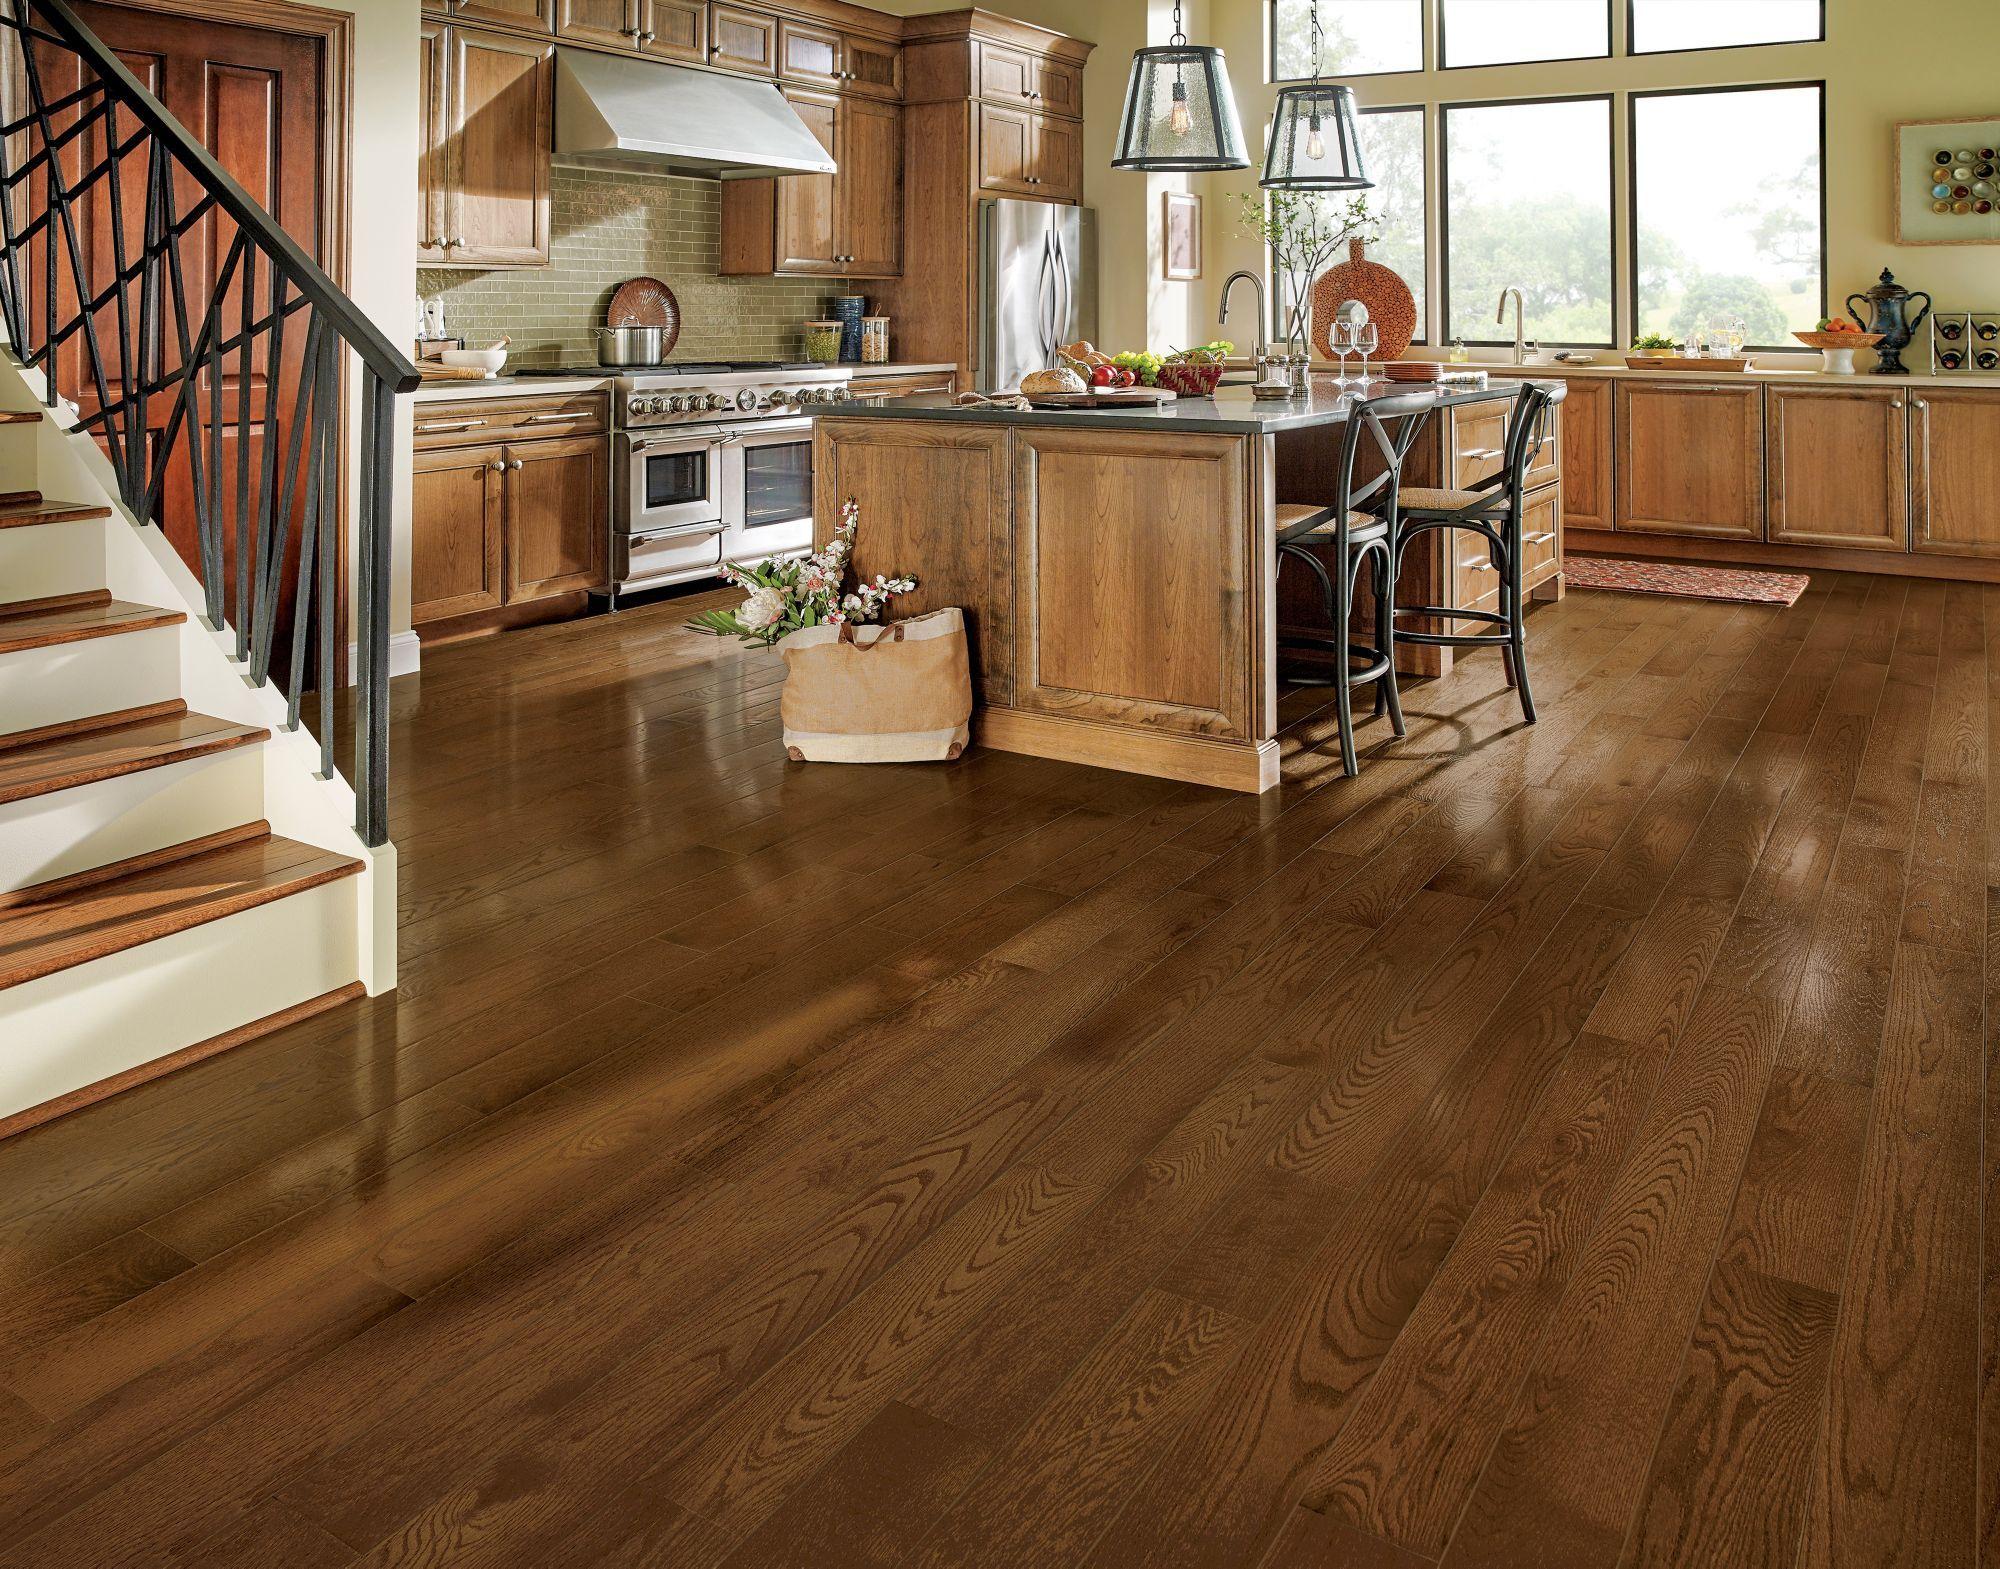 luxury vinyl scrape from floors hardwood pin tile wood american hickory on gold and flooring savings great laminate armstrong floor rush